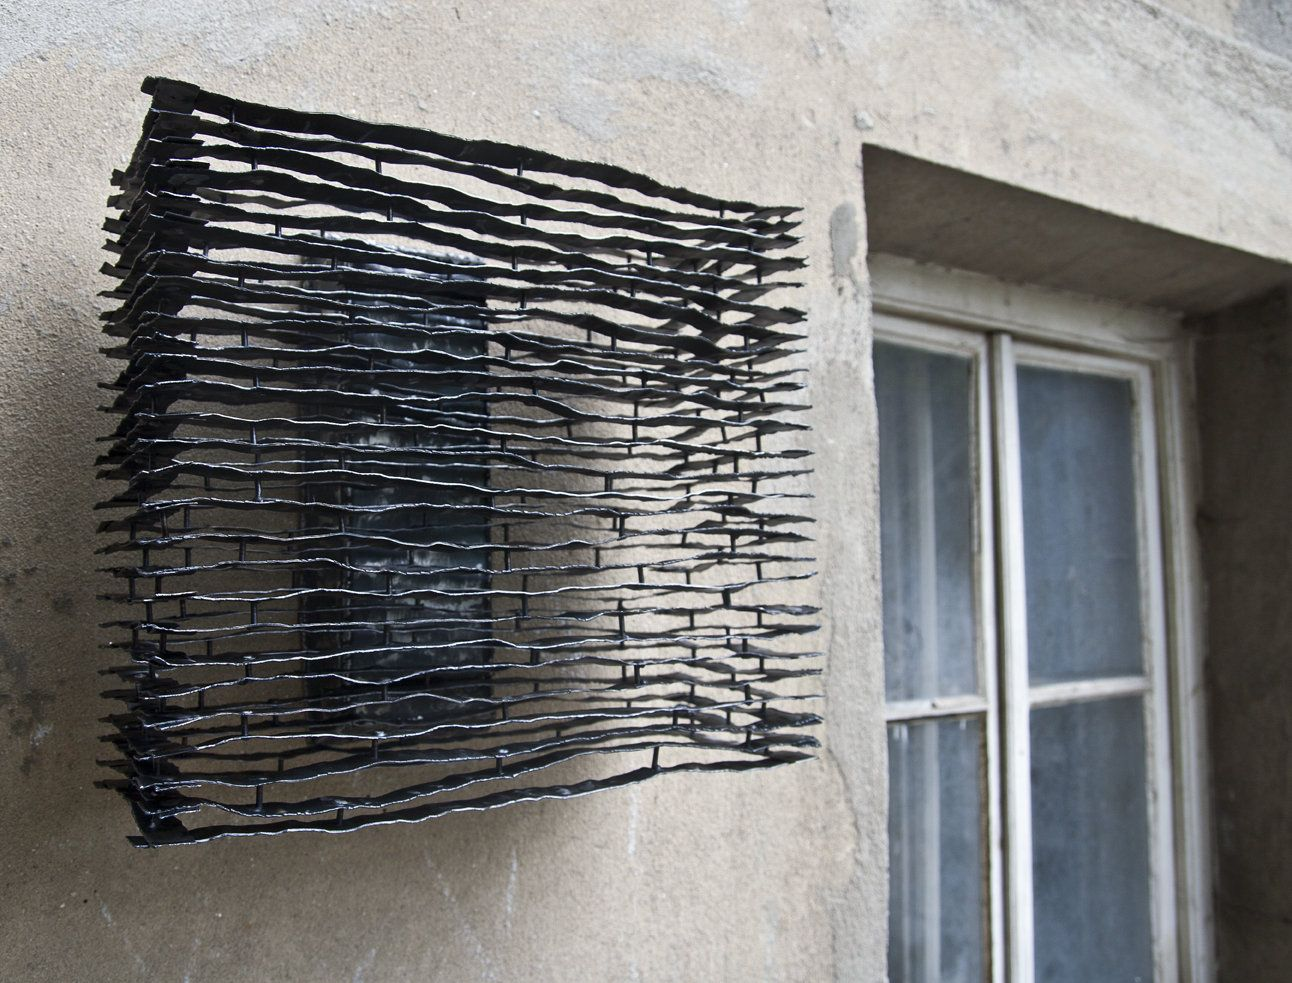 Industrial Metal Wall Sculpture Wrought Iron Steel Art Design Etsy Metal Wall Sculpture Wall Sculptures Iron Wall Art